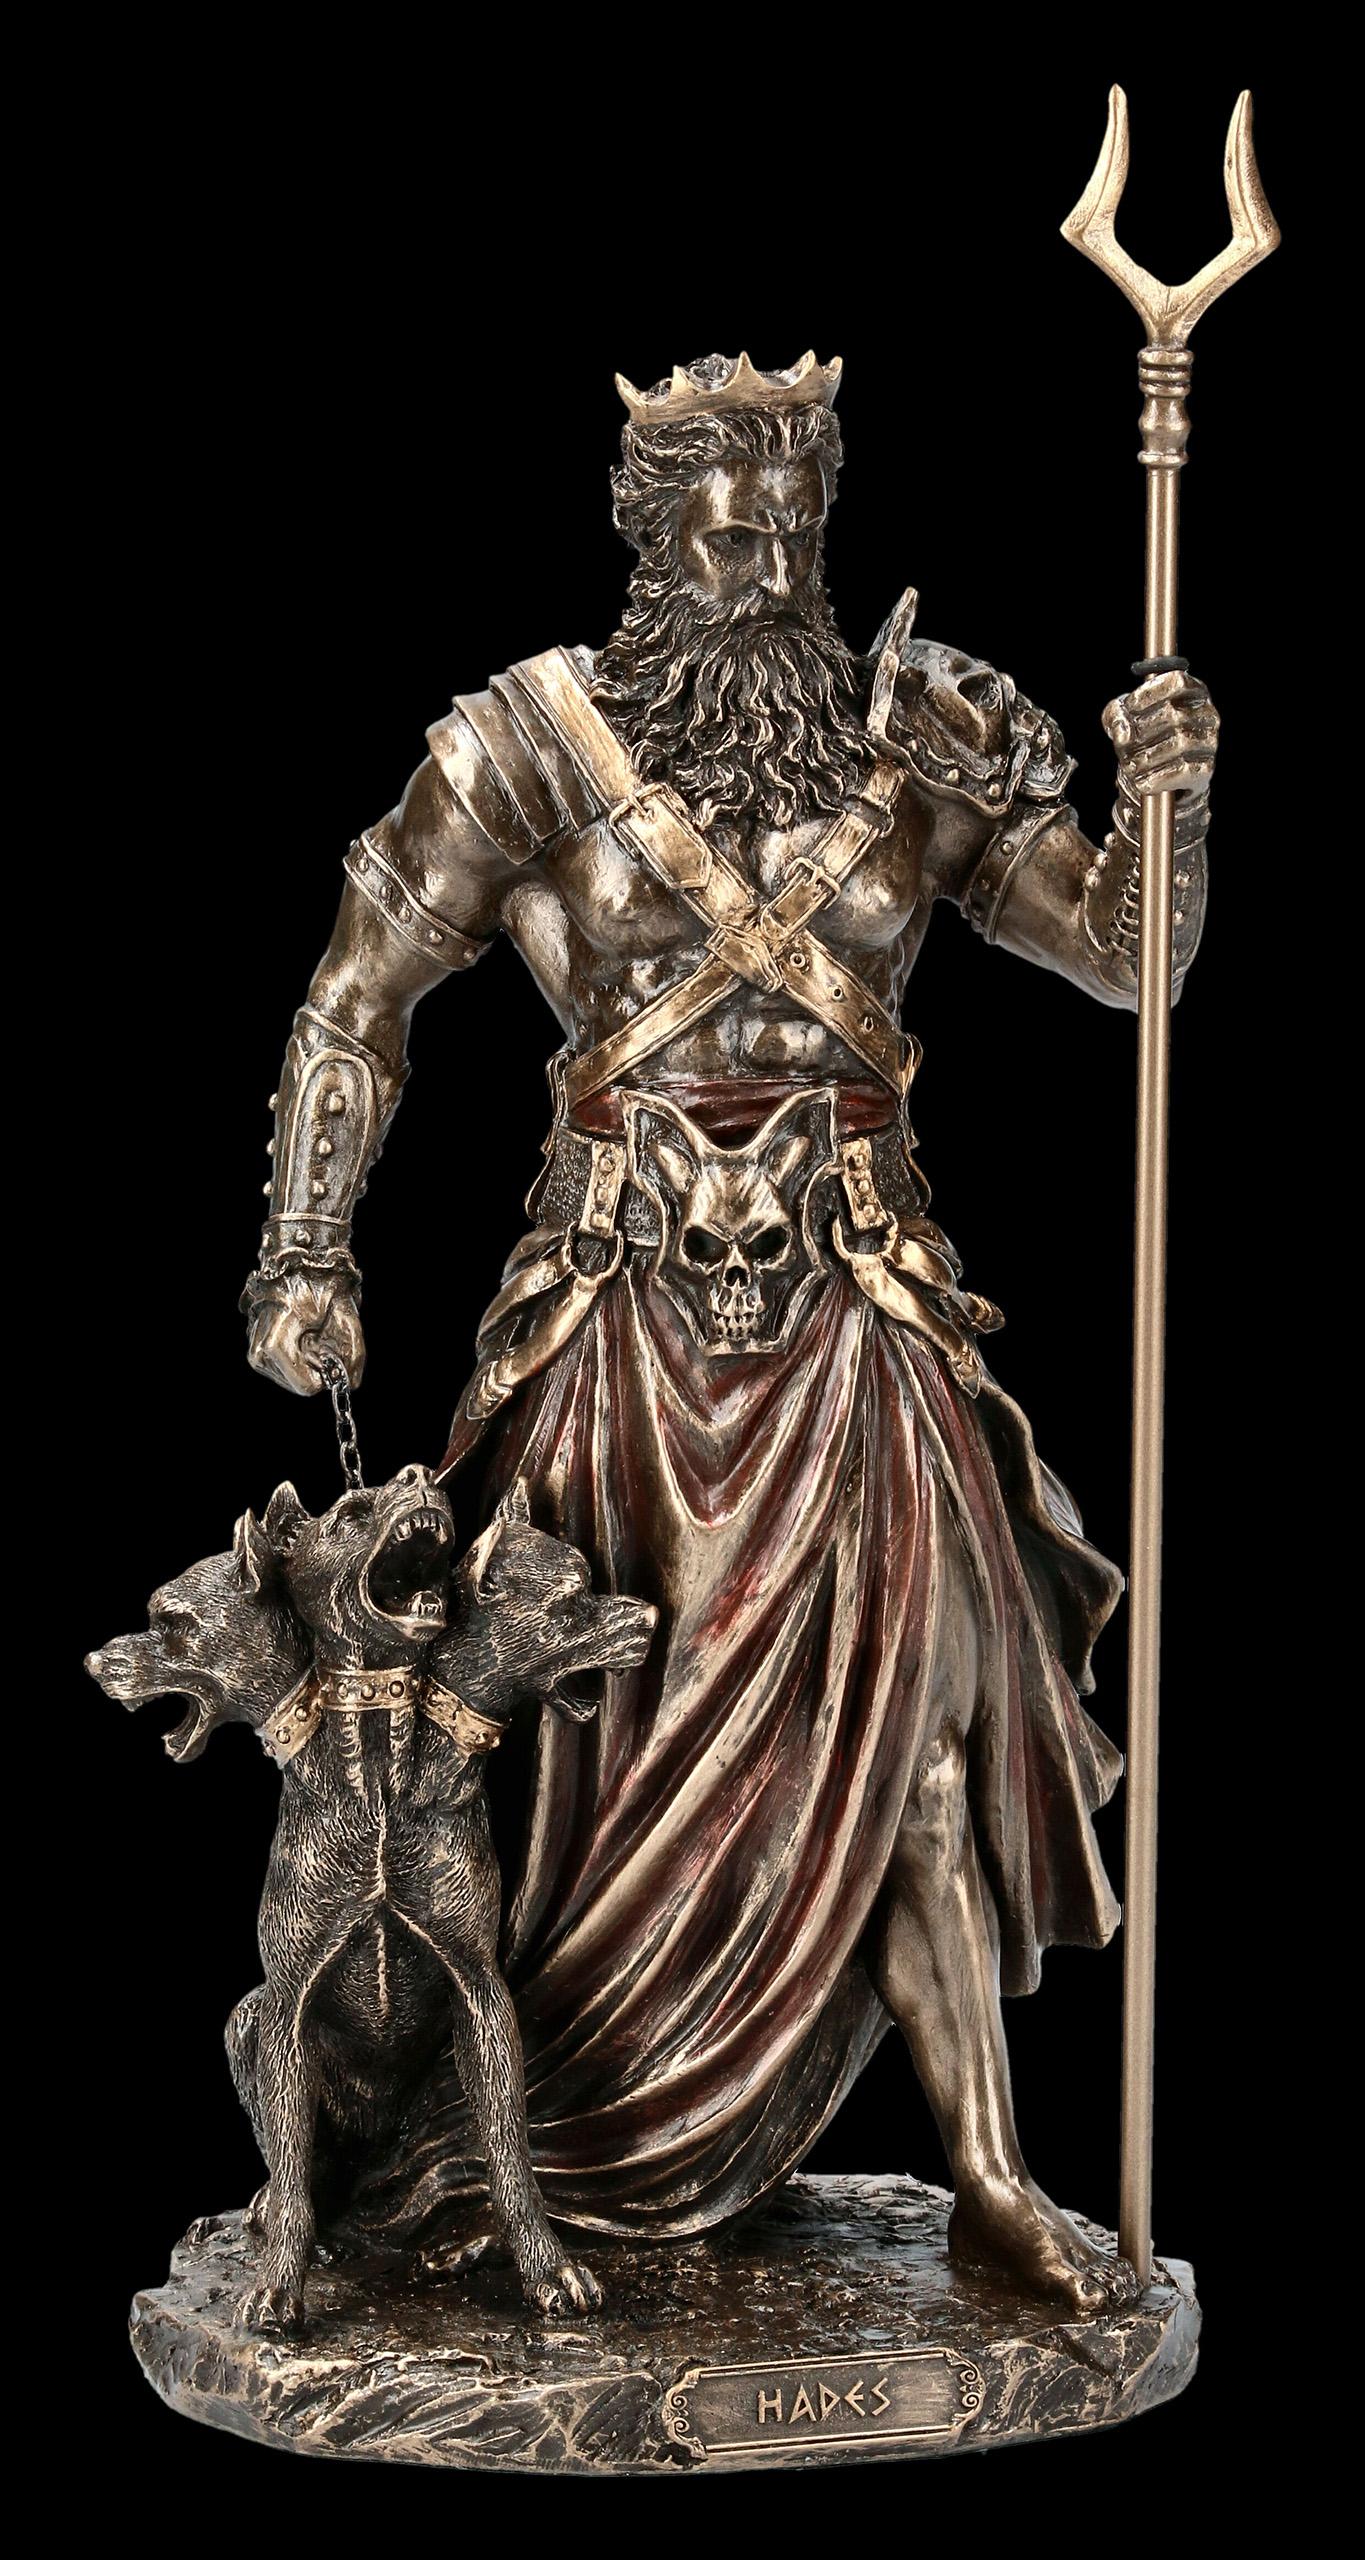 Hades Figurine God Of Death With Cerberus Veronese Www Figuren Shop De